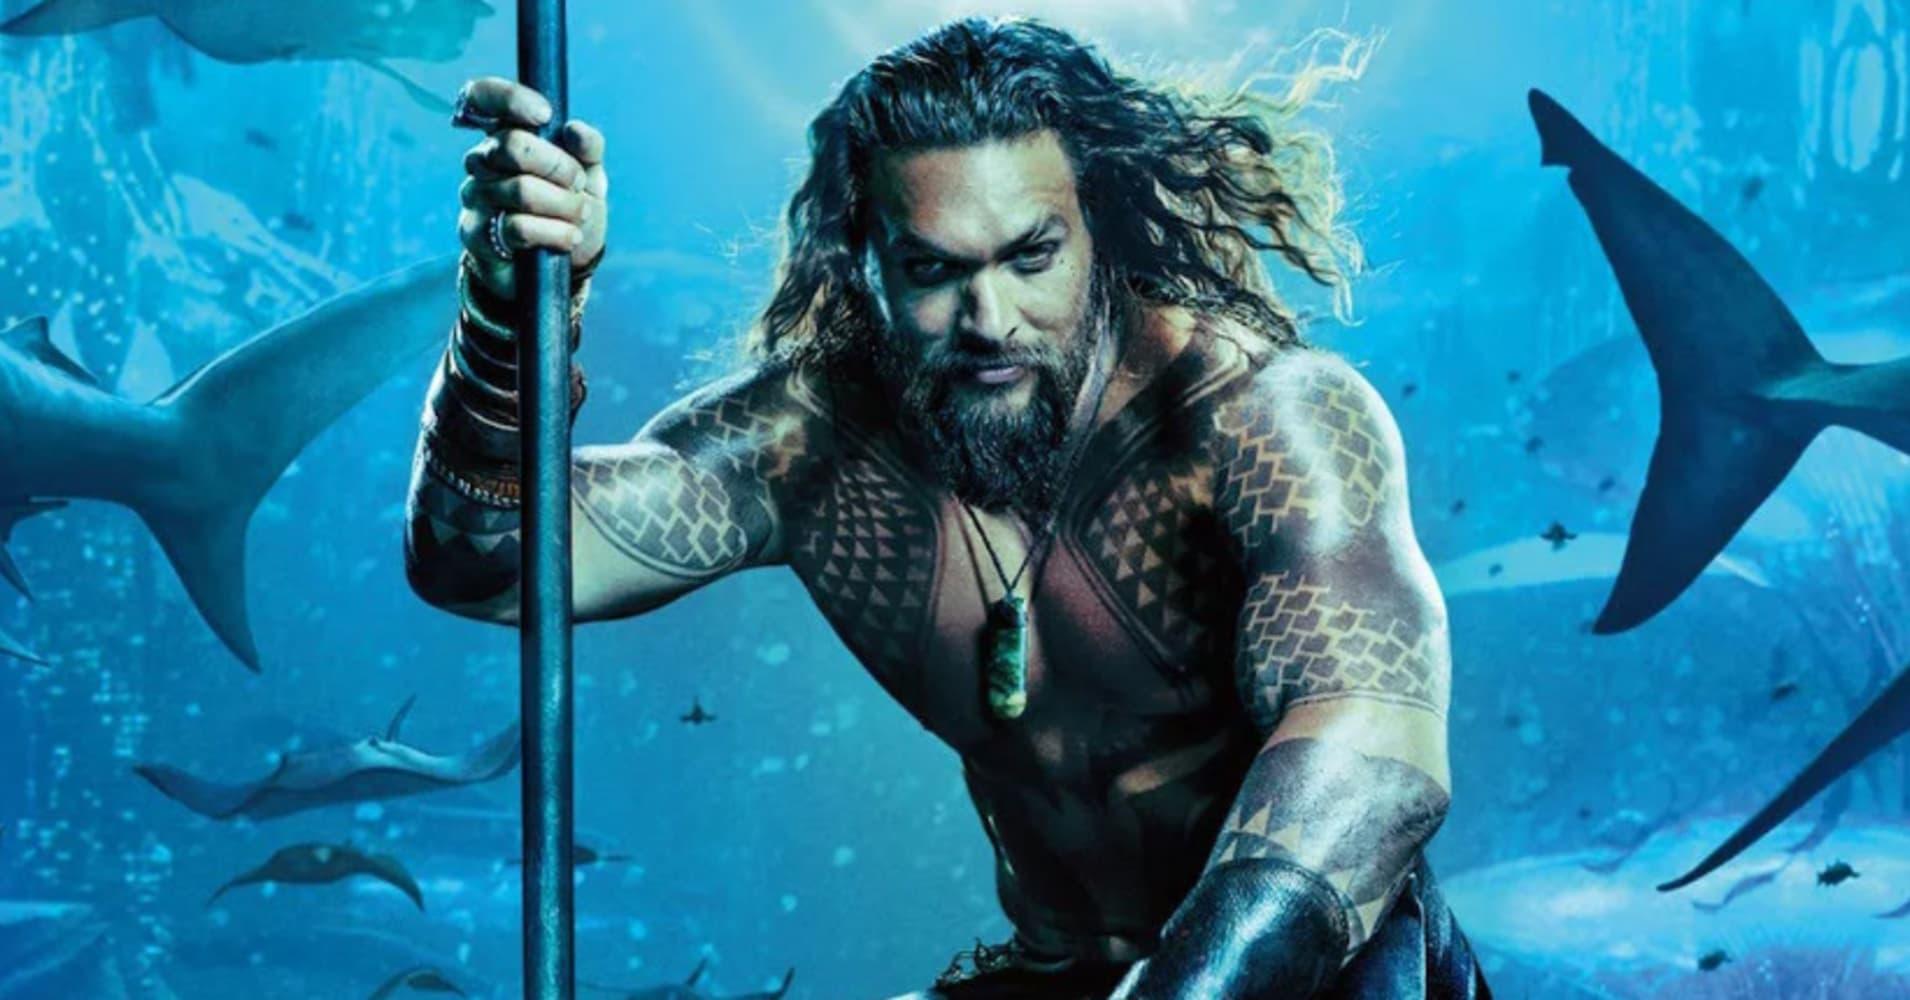 'Aquaman' tops billion-dollar benchmark thanks to international ticket sales